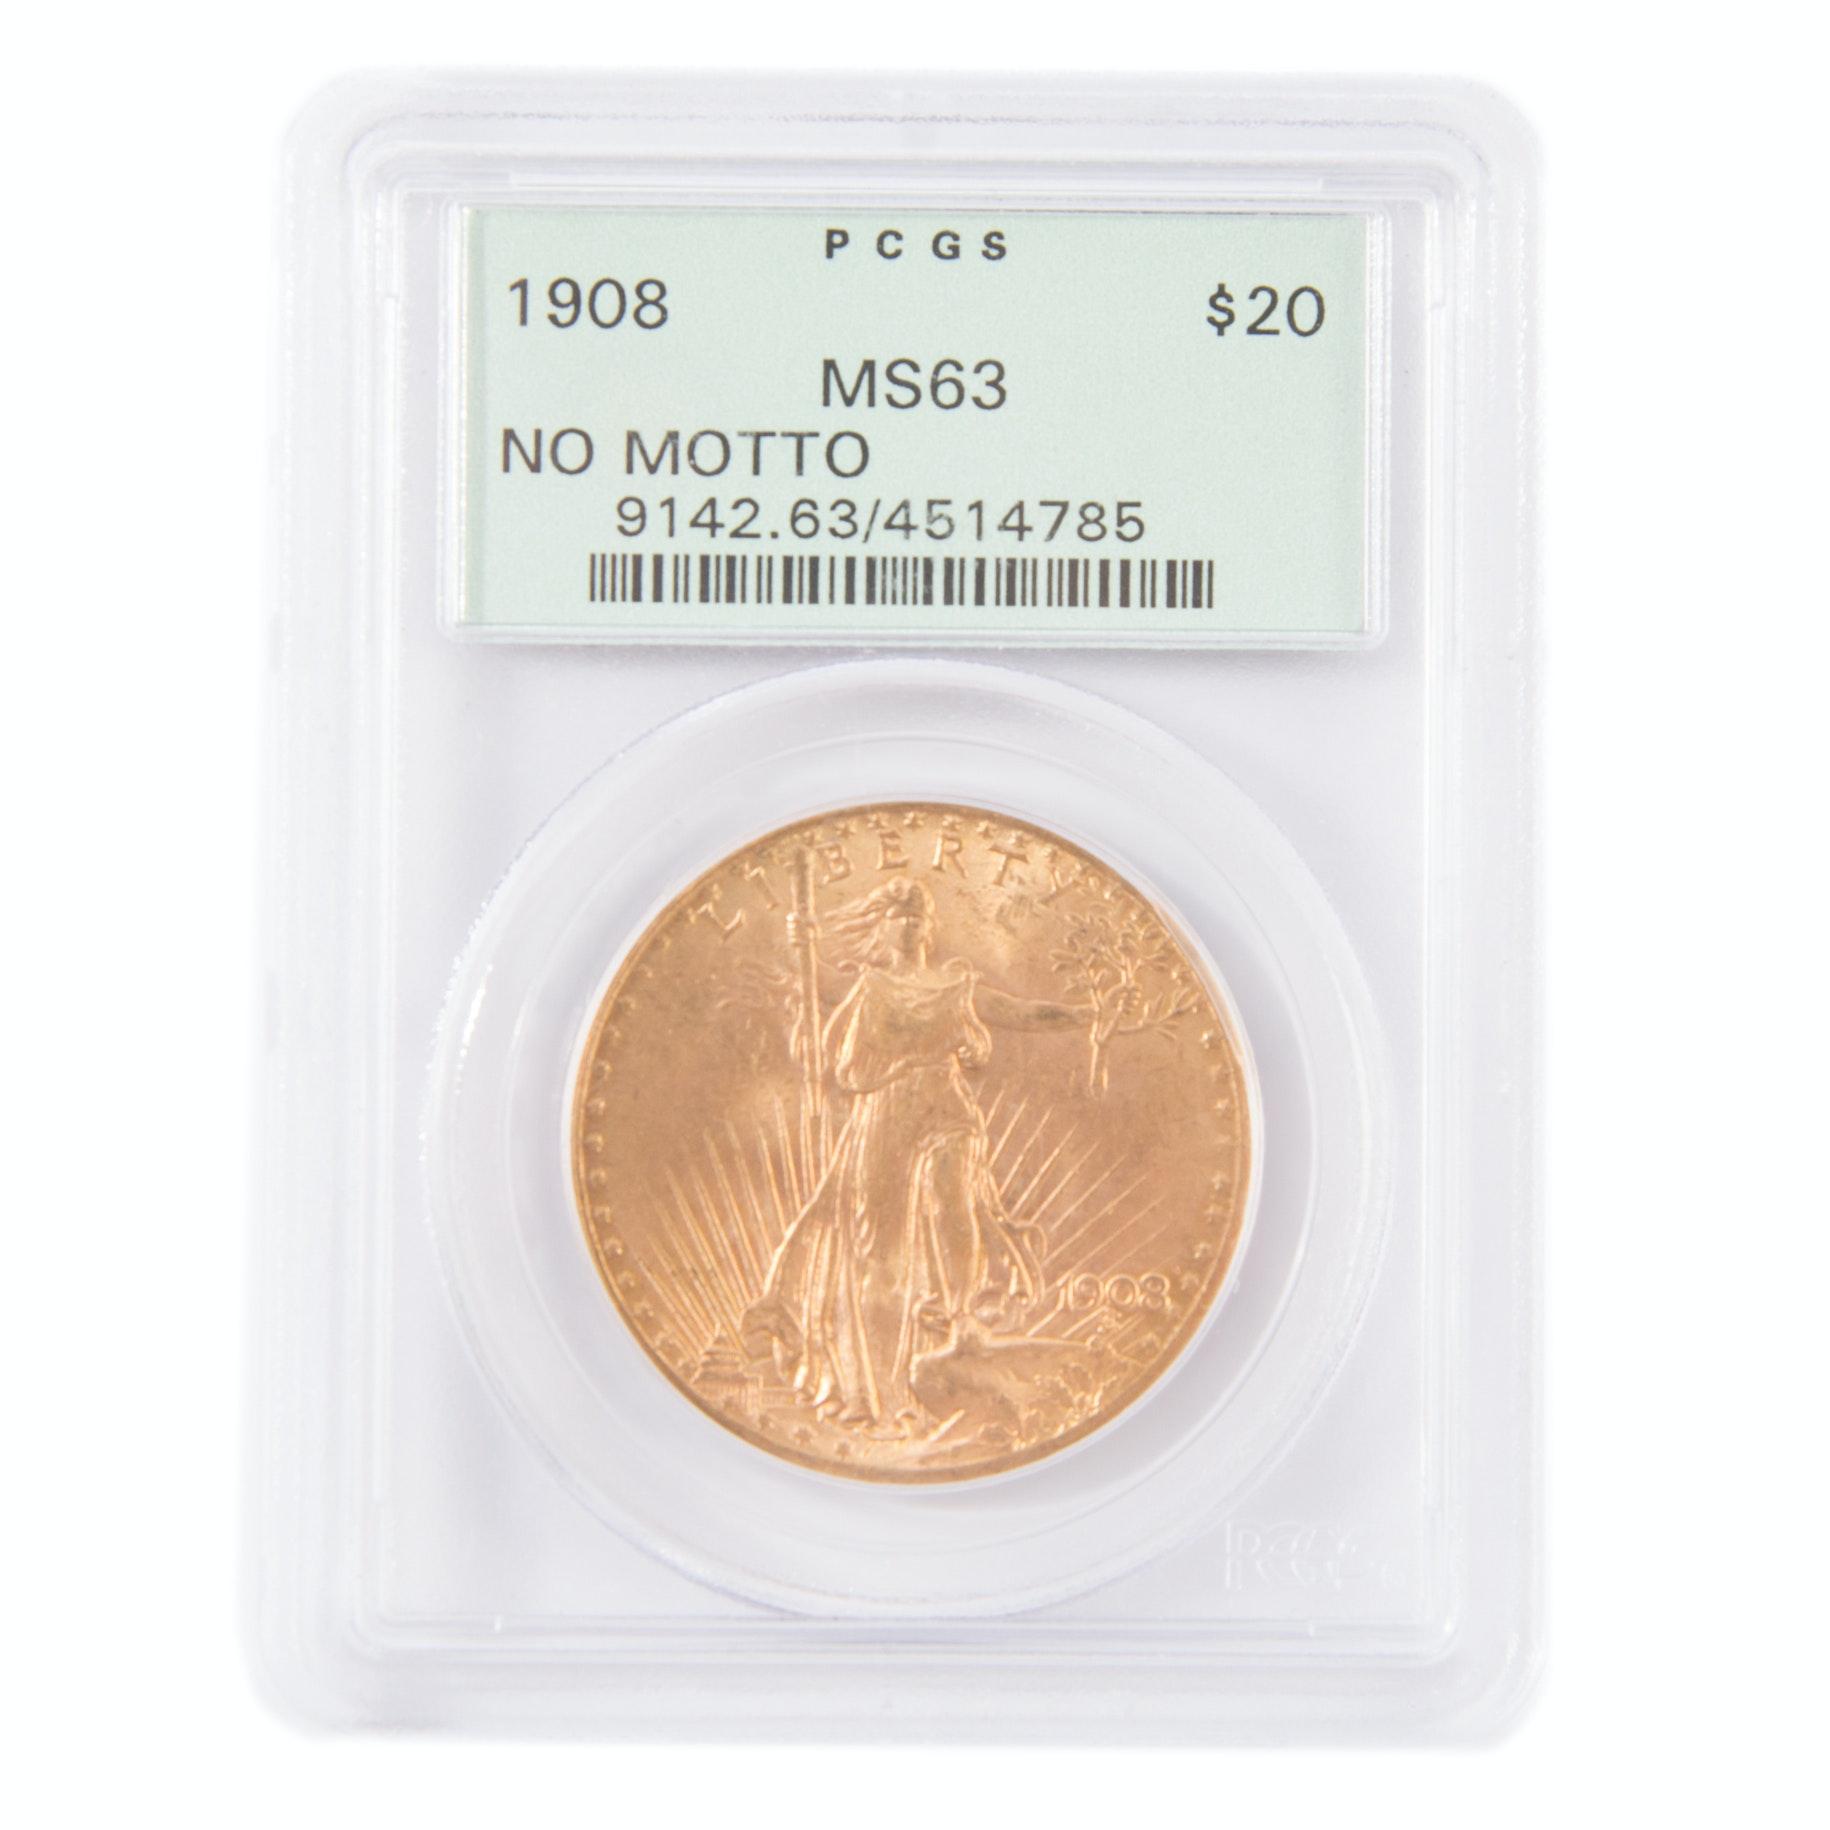 1908 Saint Gaudens Gold Twenty Dollar Coin Graded MS63 by PCGS